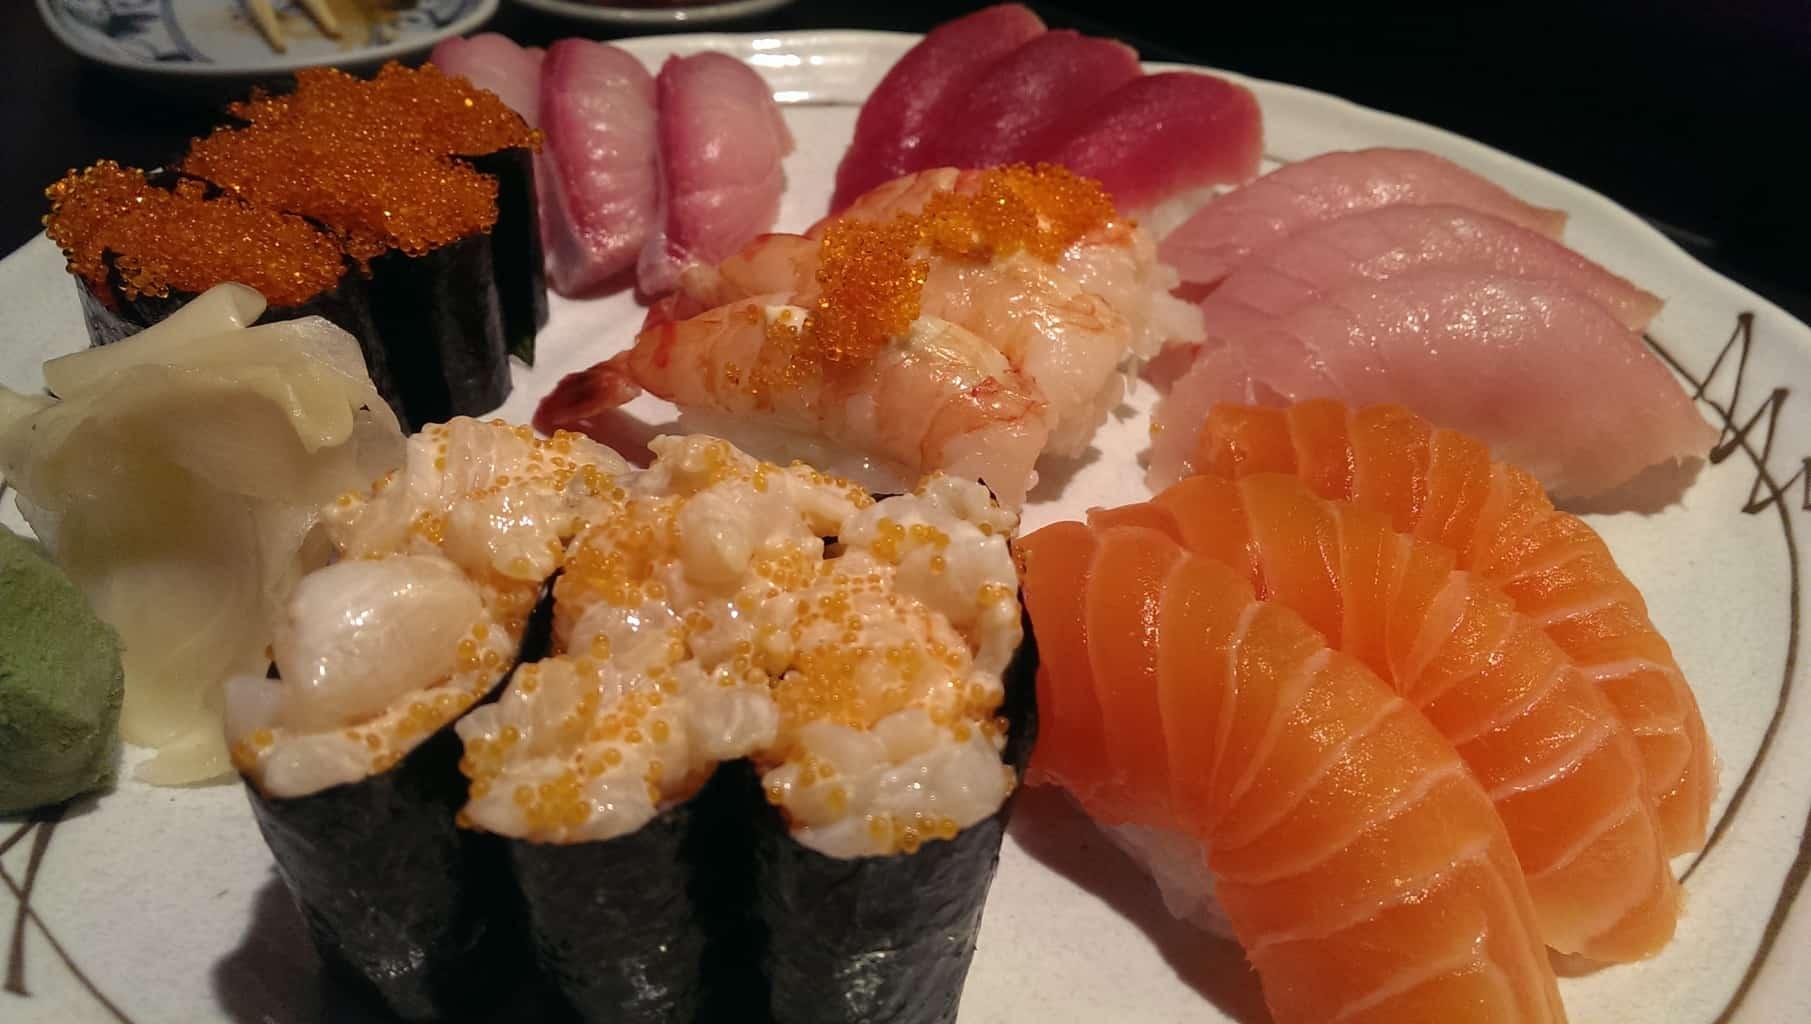 sushi combo cc (21 pieces of nigiri: 3 pieces each of tuna, red tuna, salmon, tobiko, ebi mayo, hamachi, chopped scallop)